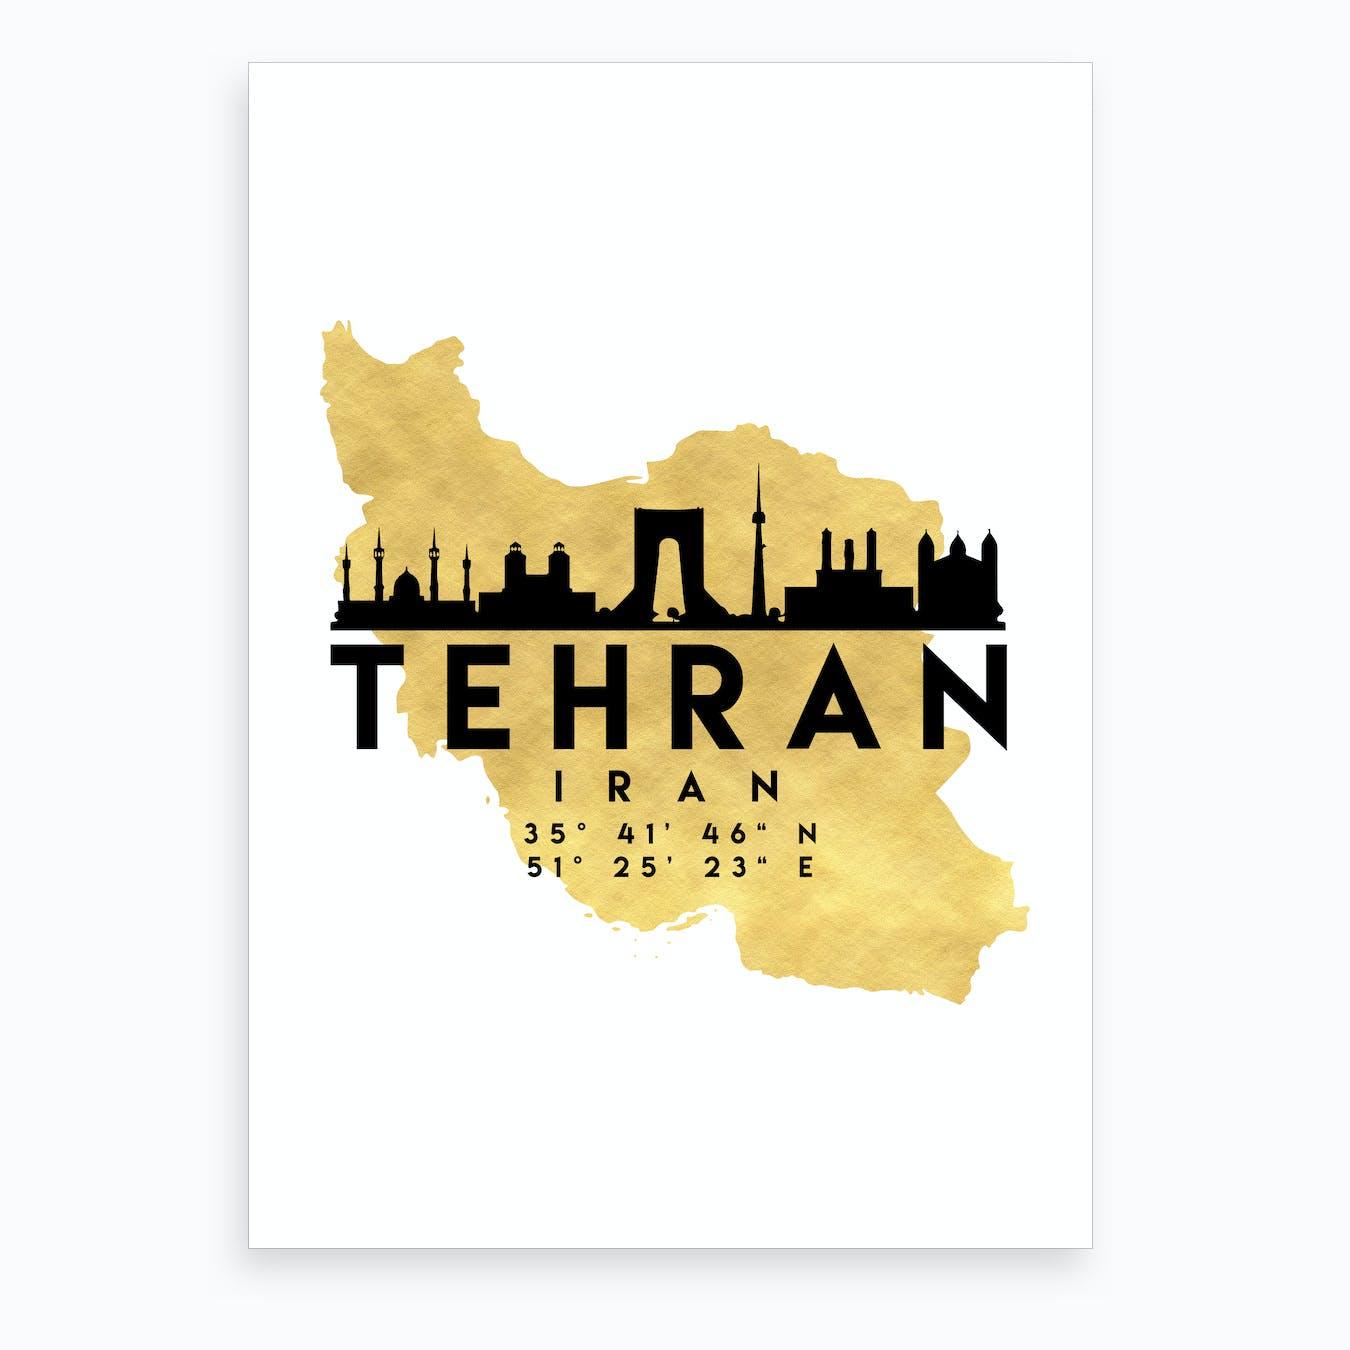 Tehran Iran Silhouette City Skyline Map